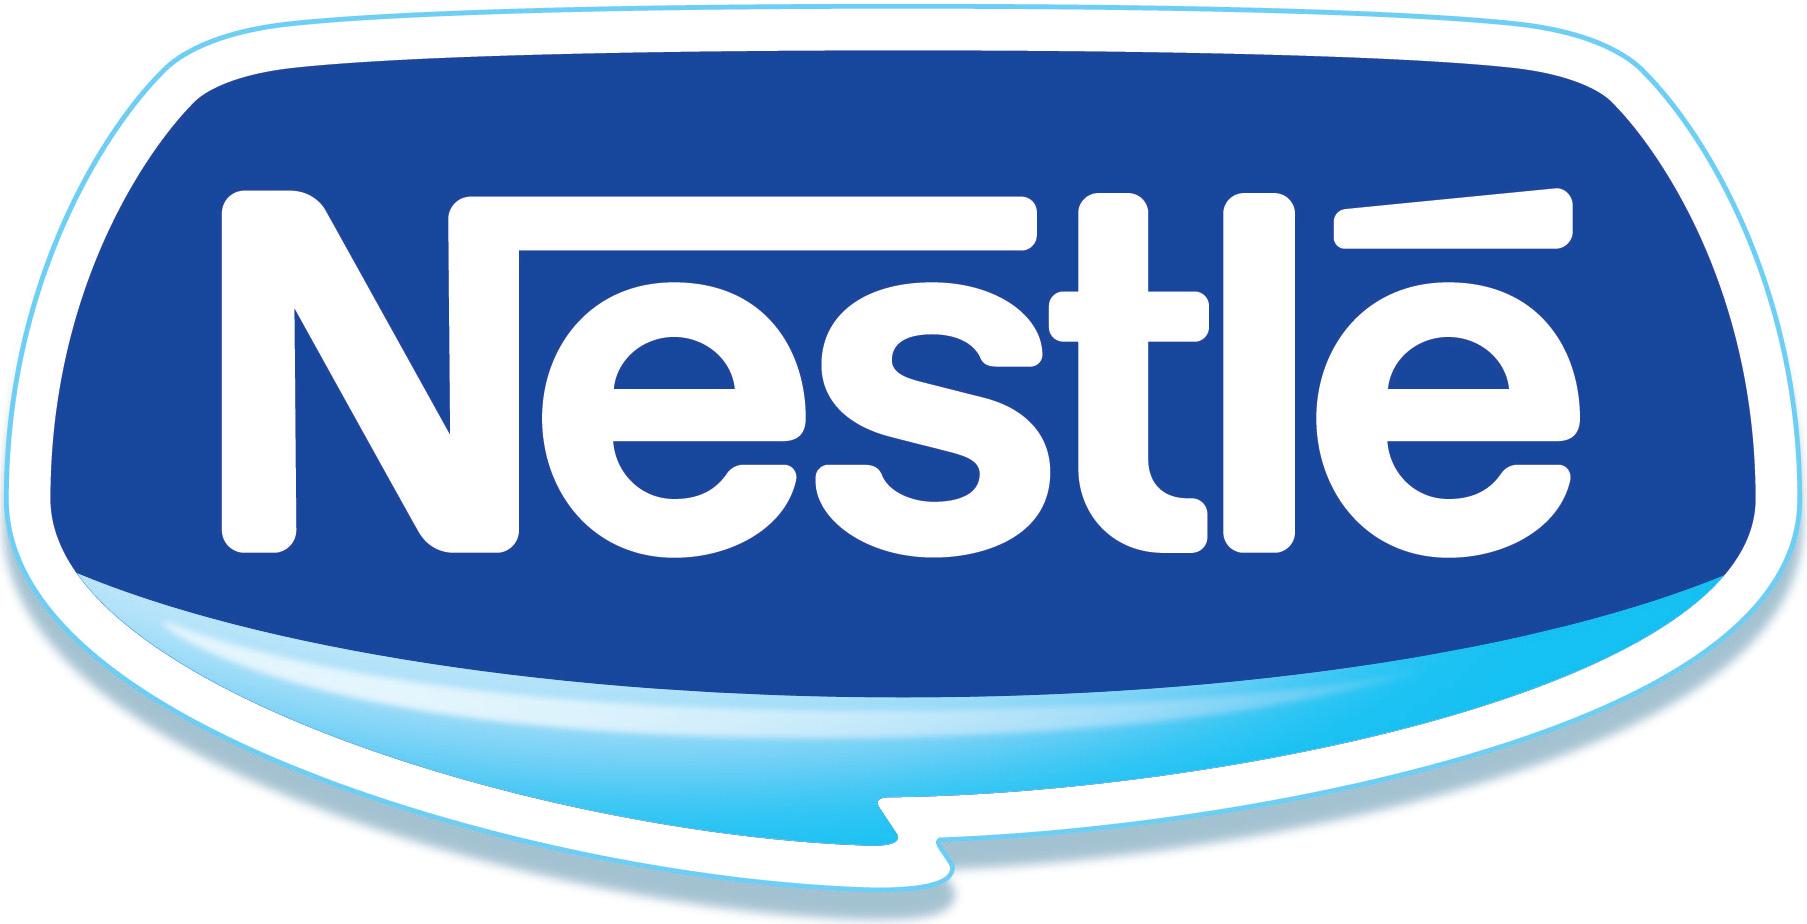 Logo Nestle Png Hdpng.com 1807 - Nestle, Transparent background PNG HD thumbnail